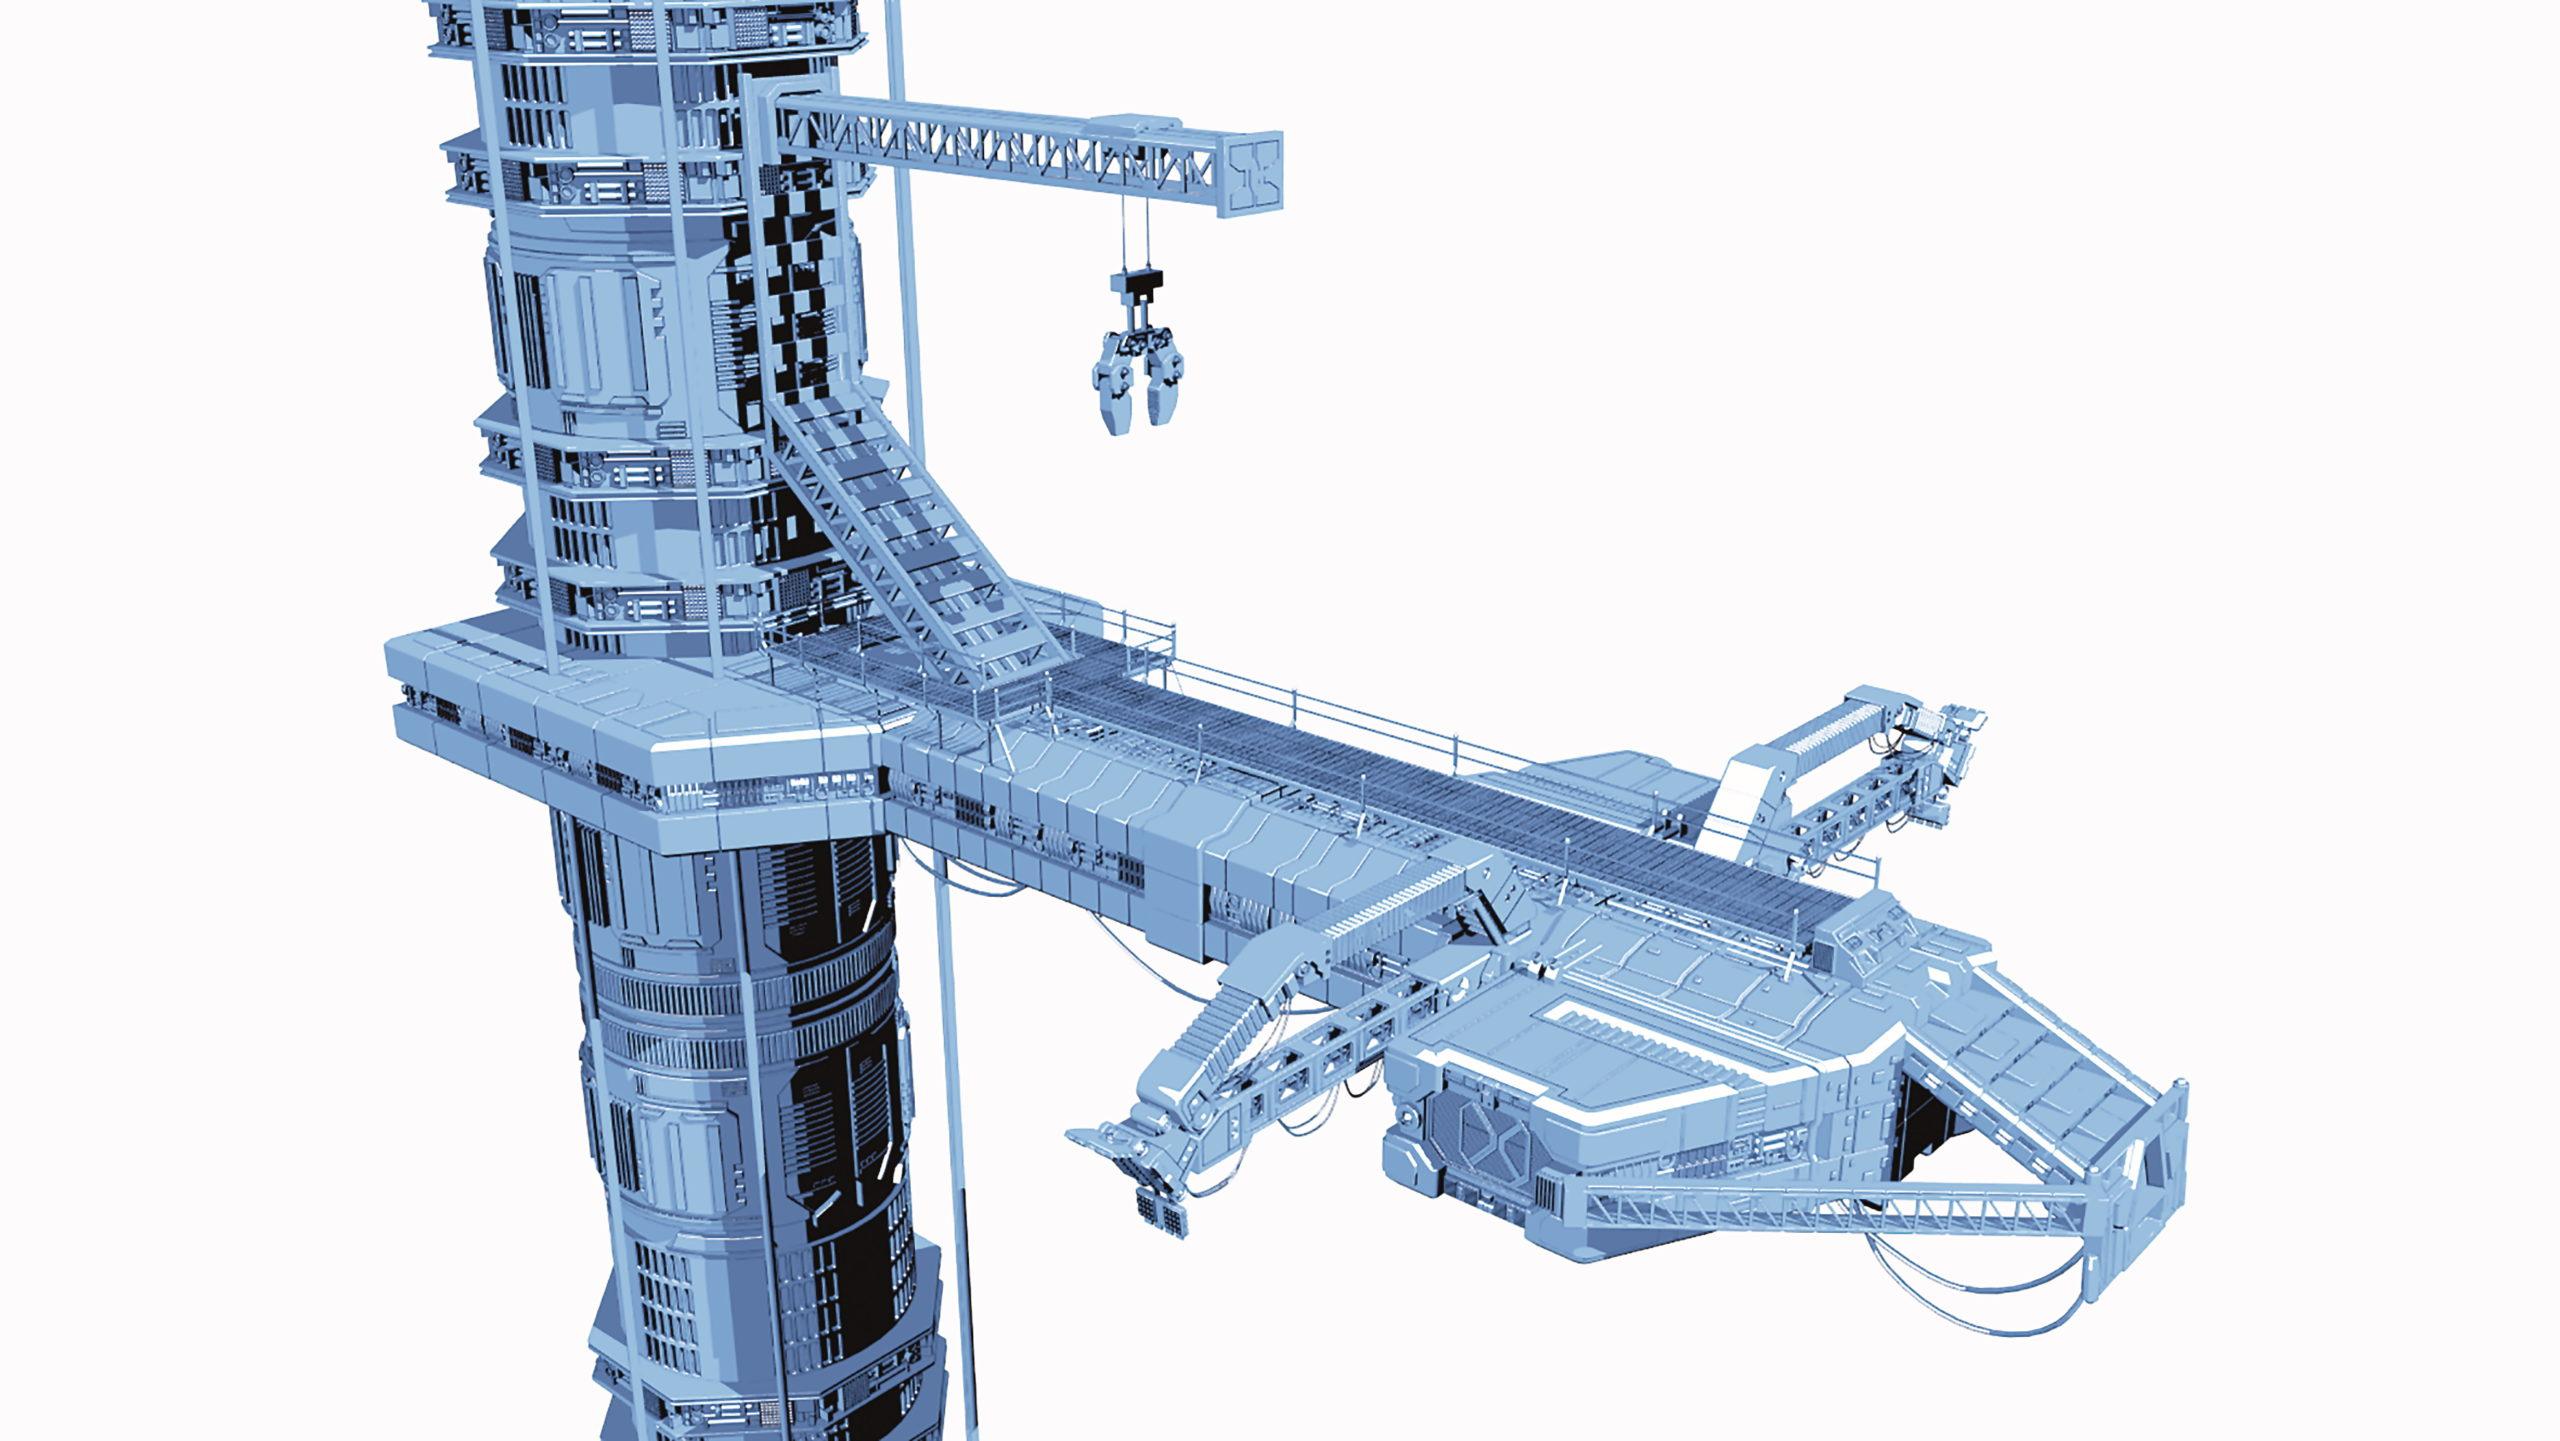 Cel Shading in Lightwave – Alien landing bay model courtsey of Russell Tawn, www.digitawn.co.uk